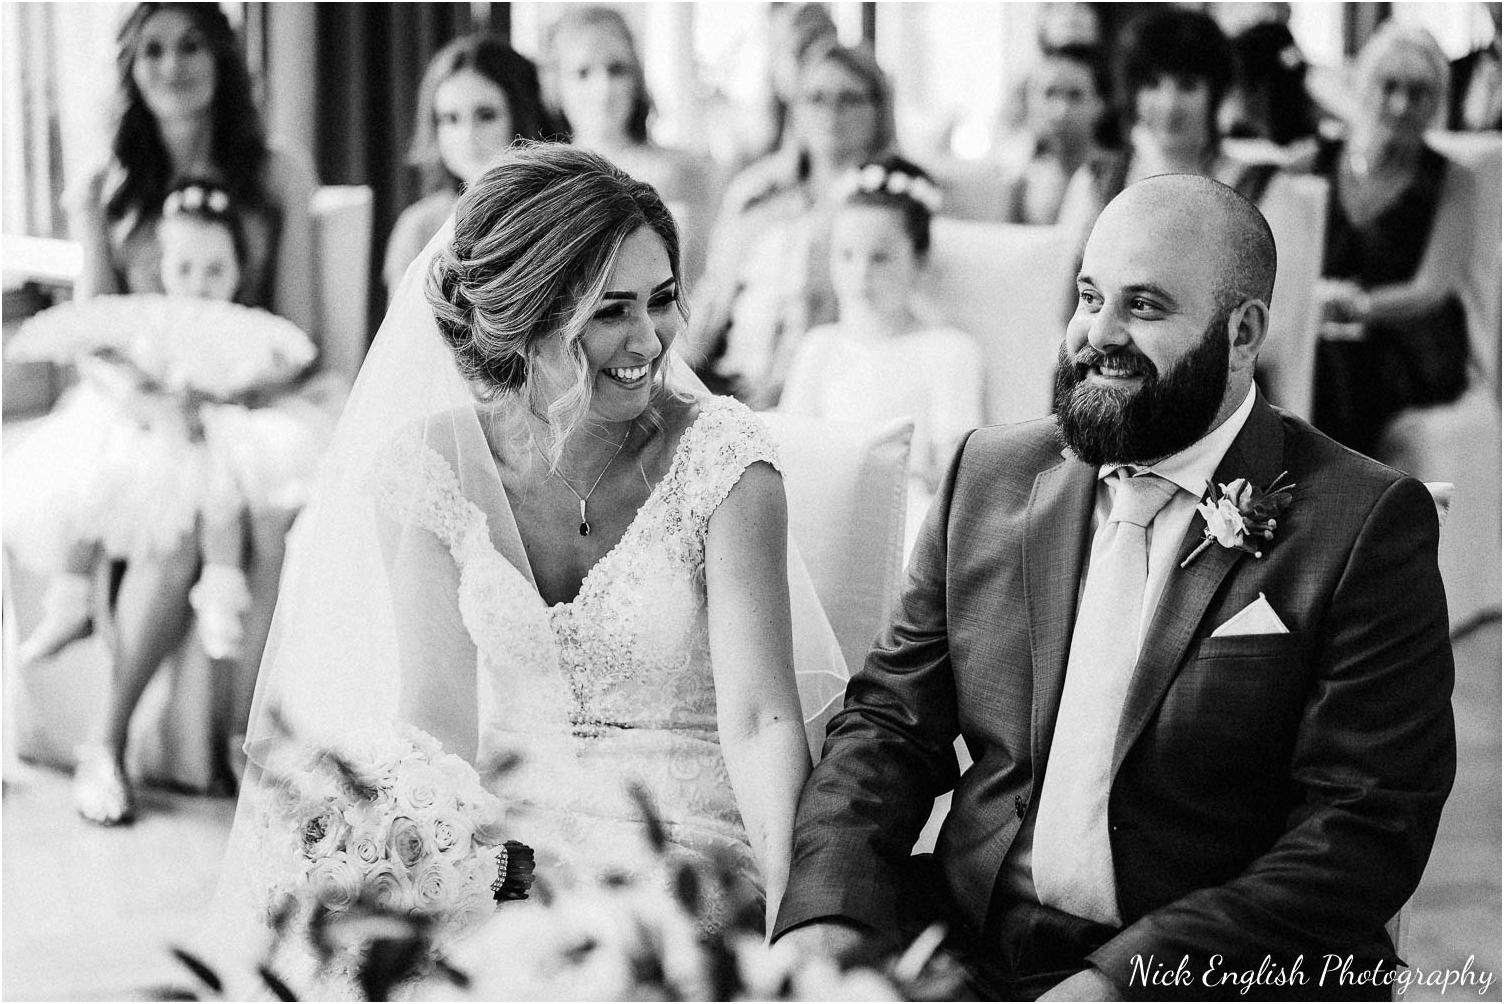 Destination_Wedding_Photographer_Slovenia_Nick_English_Photography-43.jpg